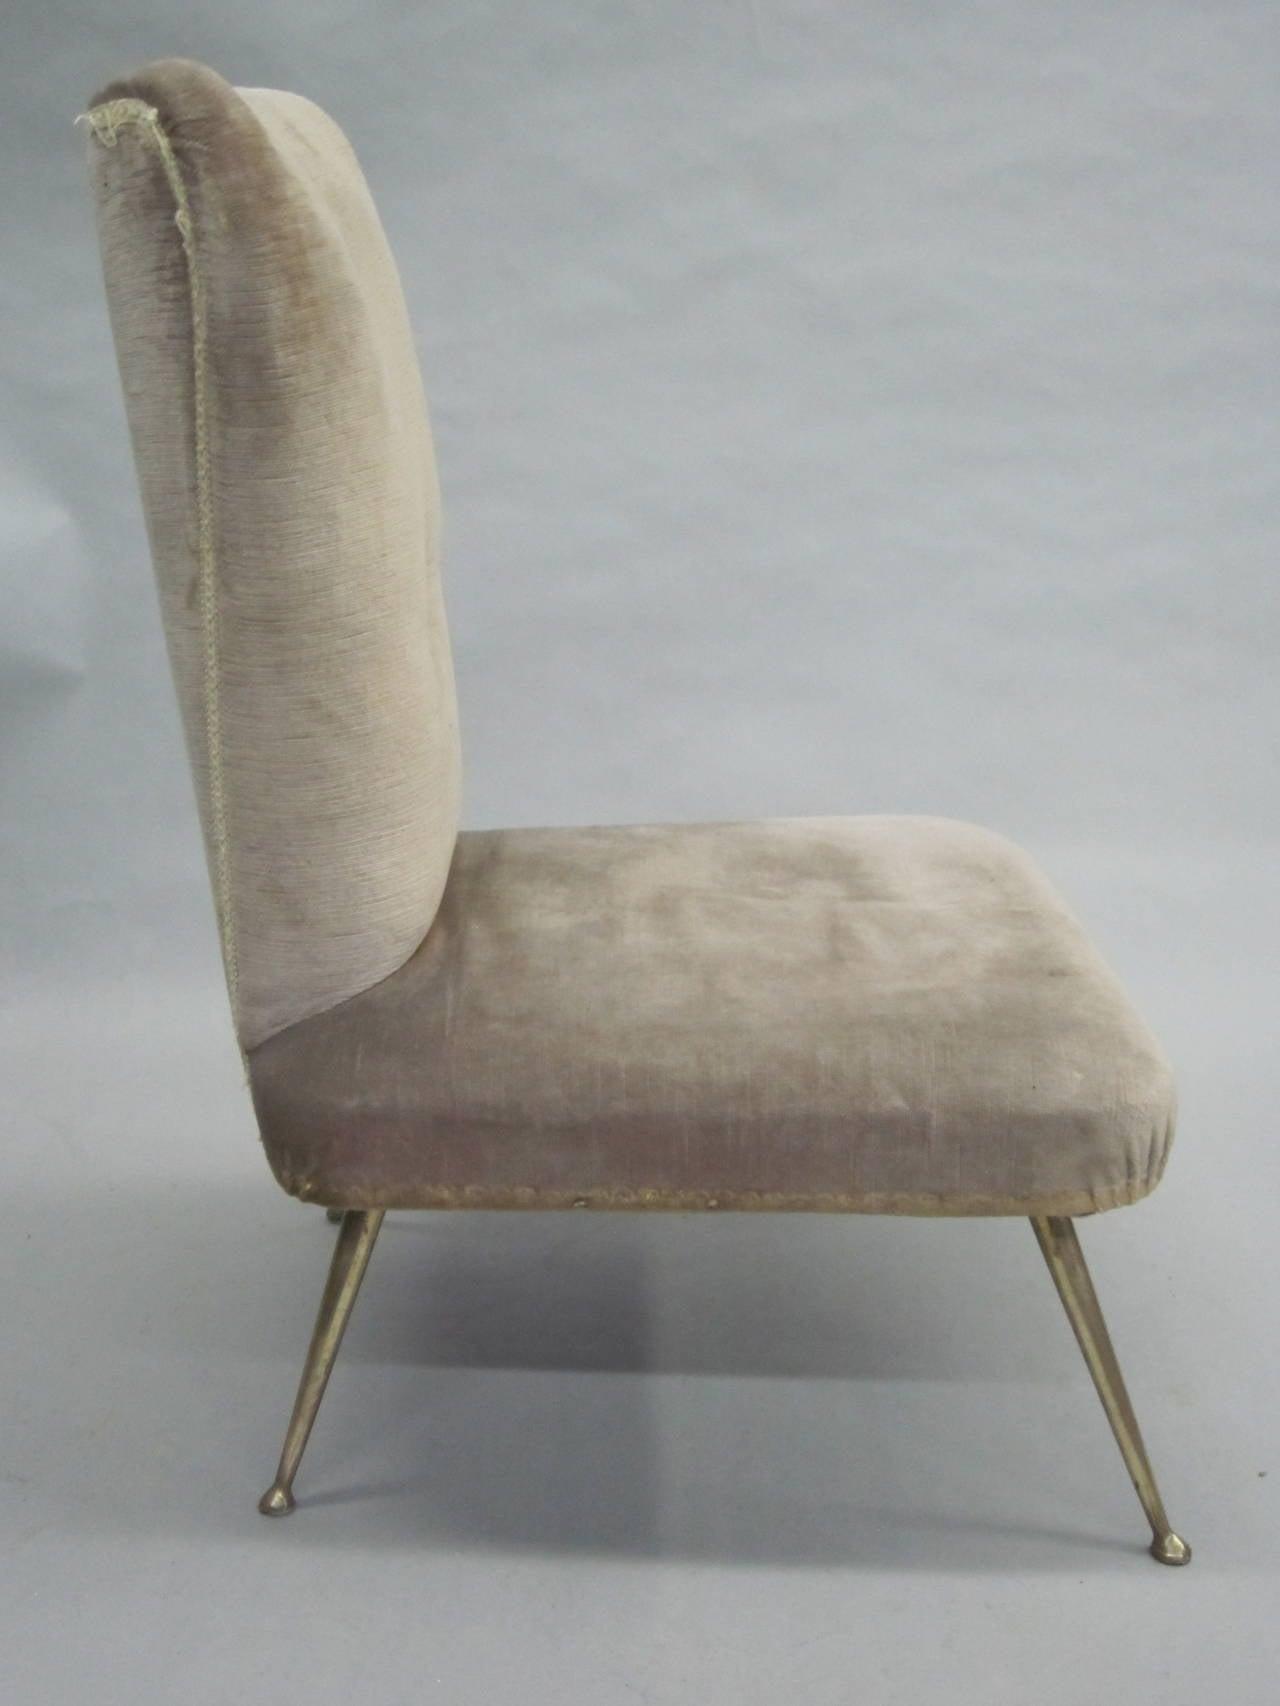 Pair of Italian Mid-Century Slipper Chairs Attributed to Marco Zanuso 3